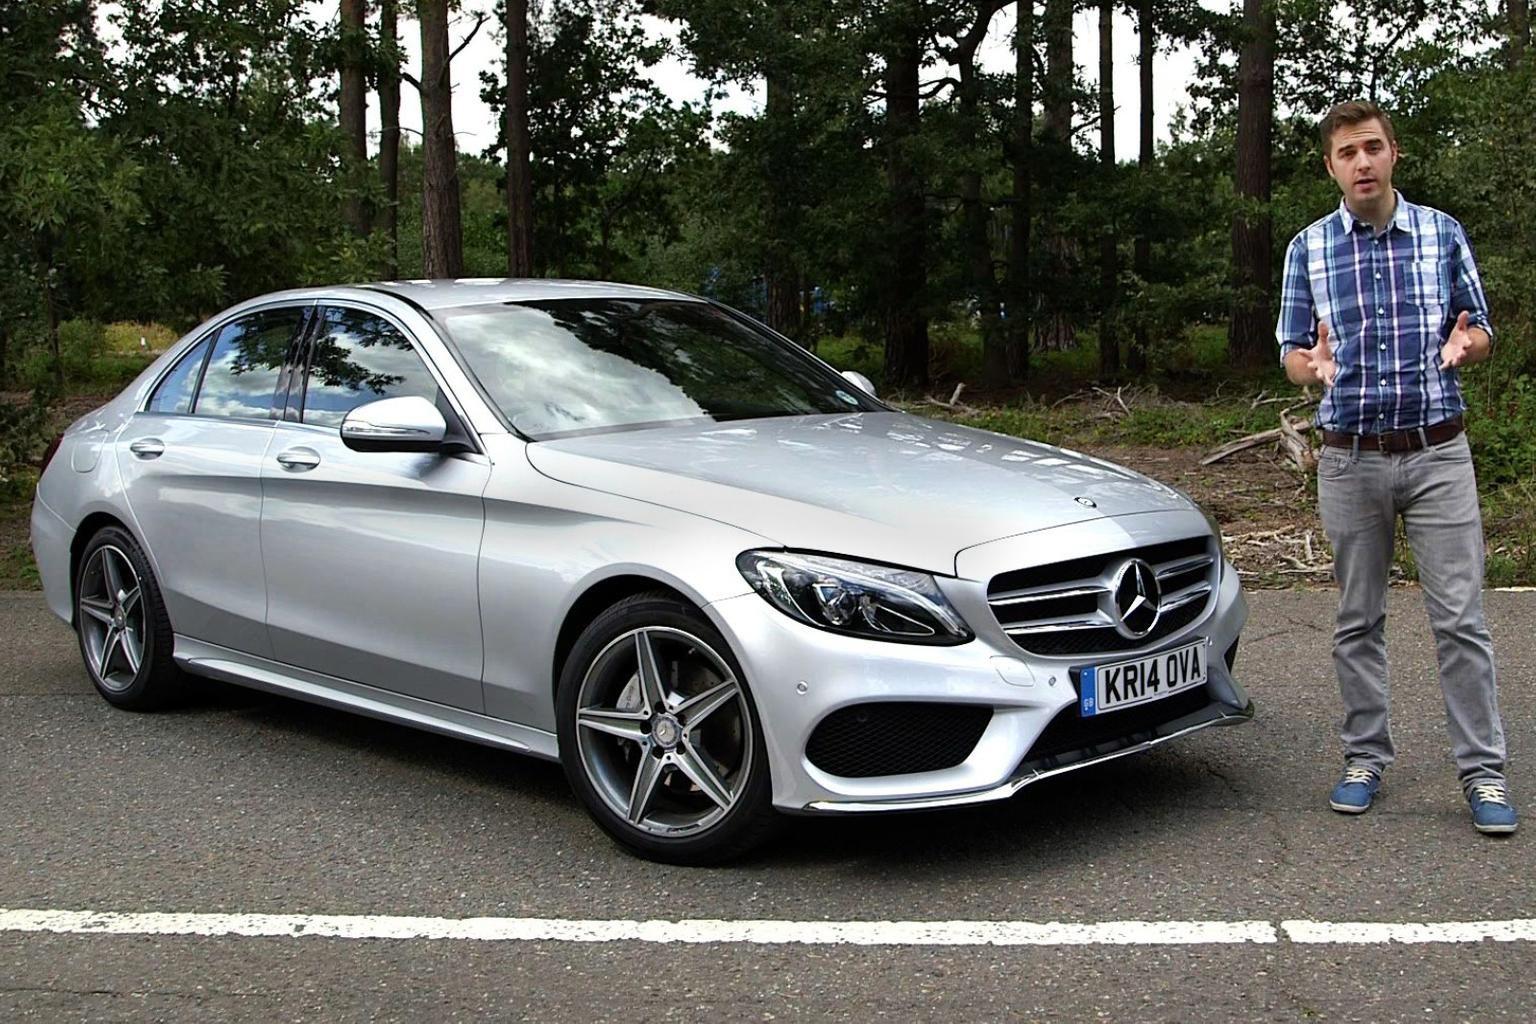 Video: Mercedes-Benz C-Class 2014 review